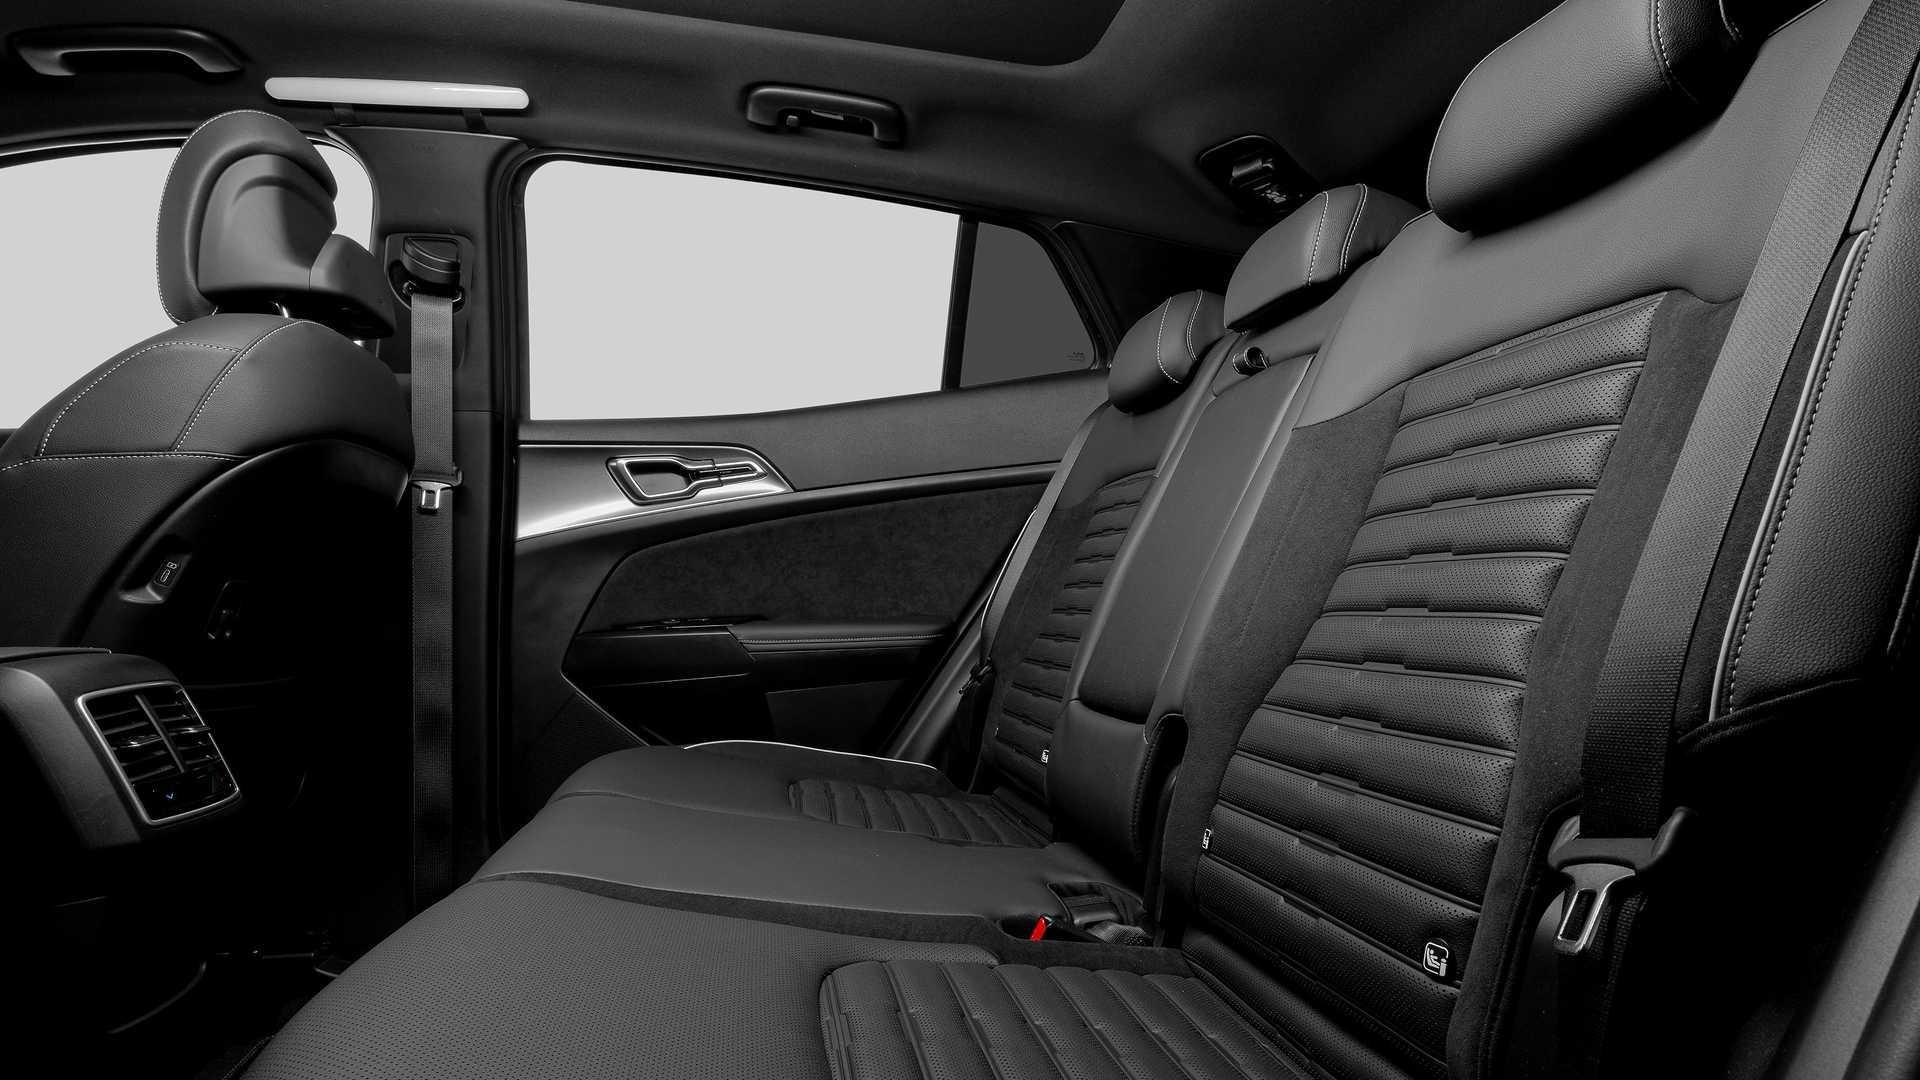 2022-kia-sportage-euro-spec-interior2.jpeg